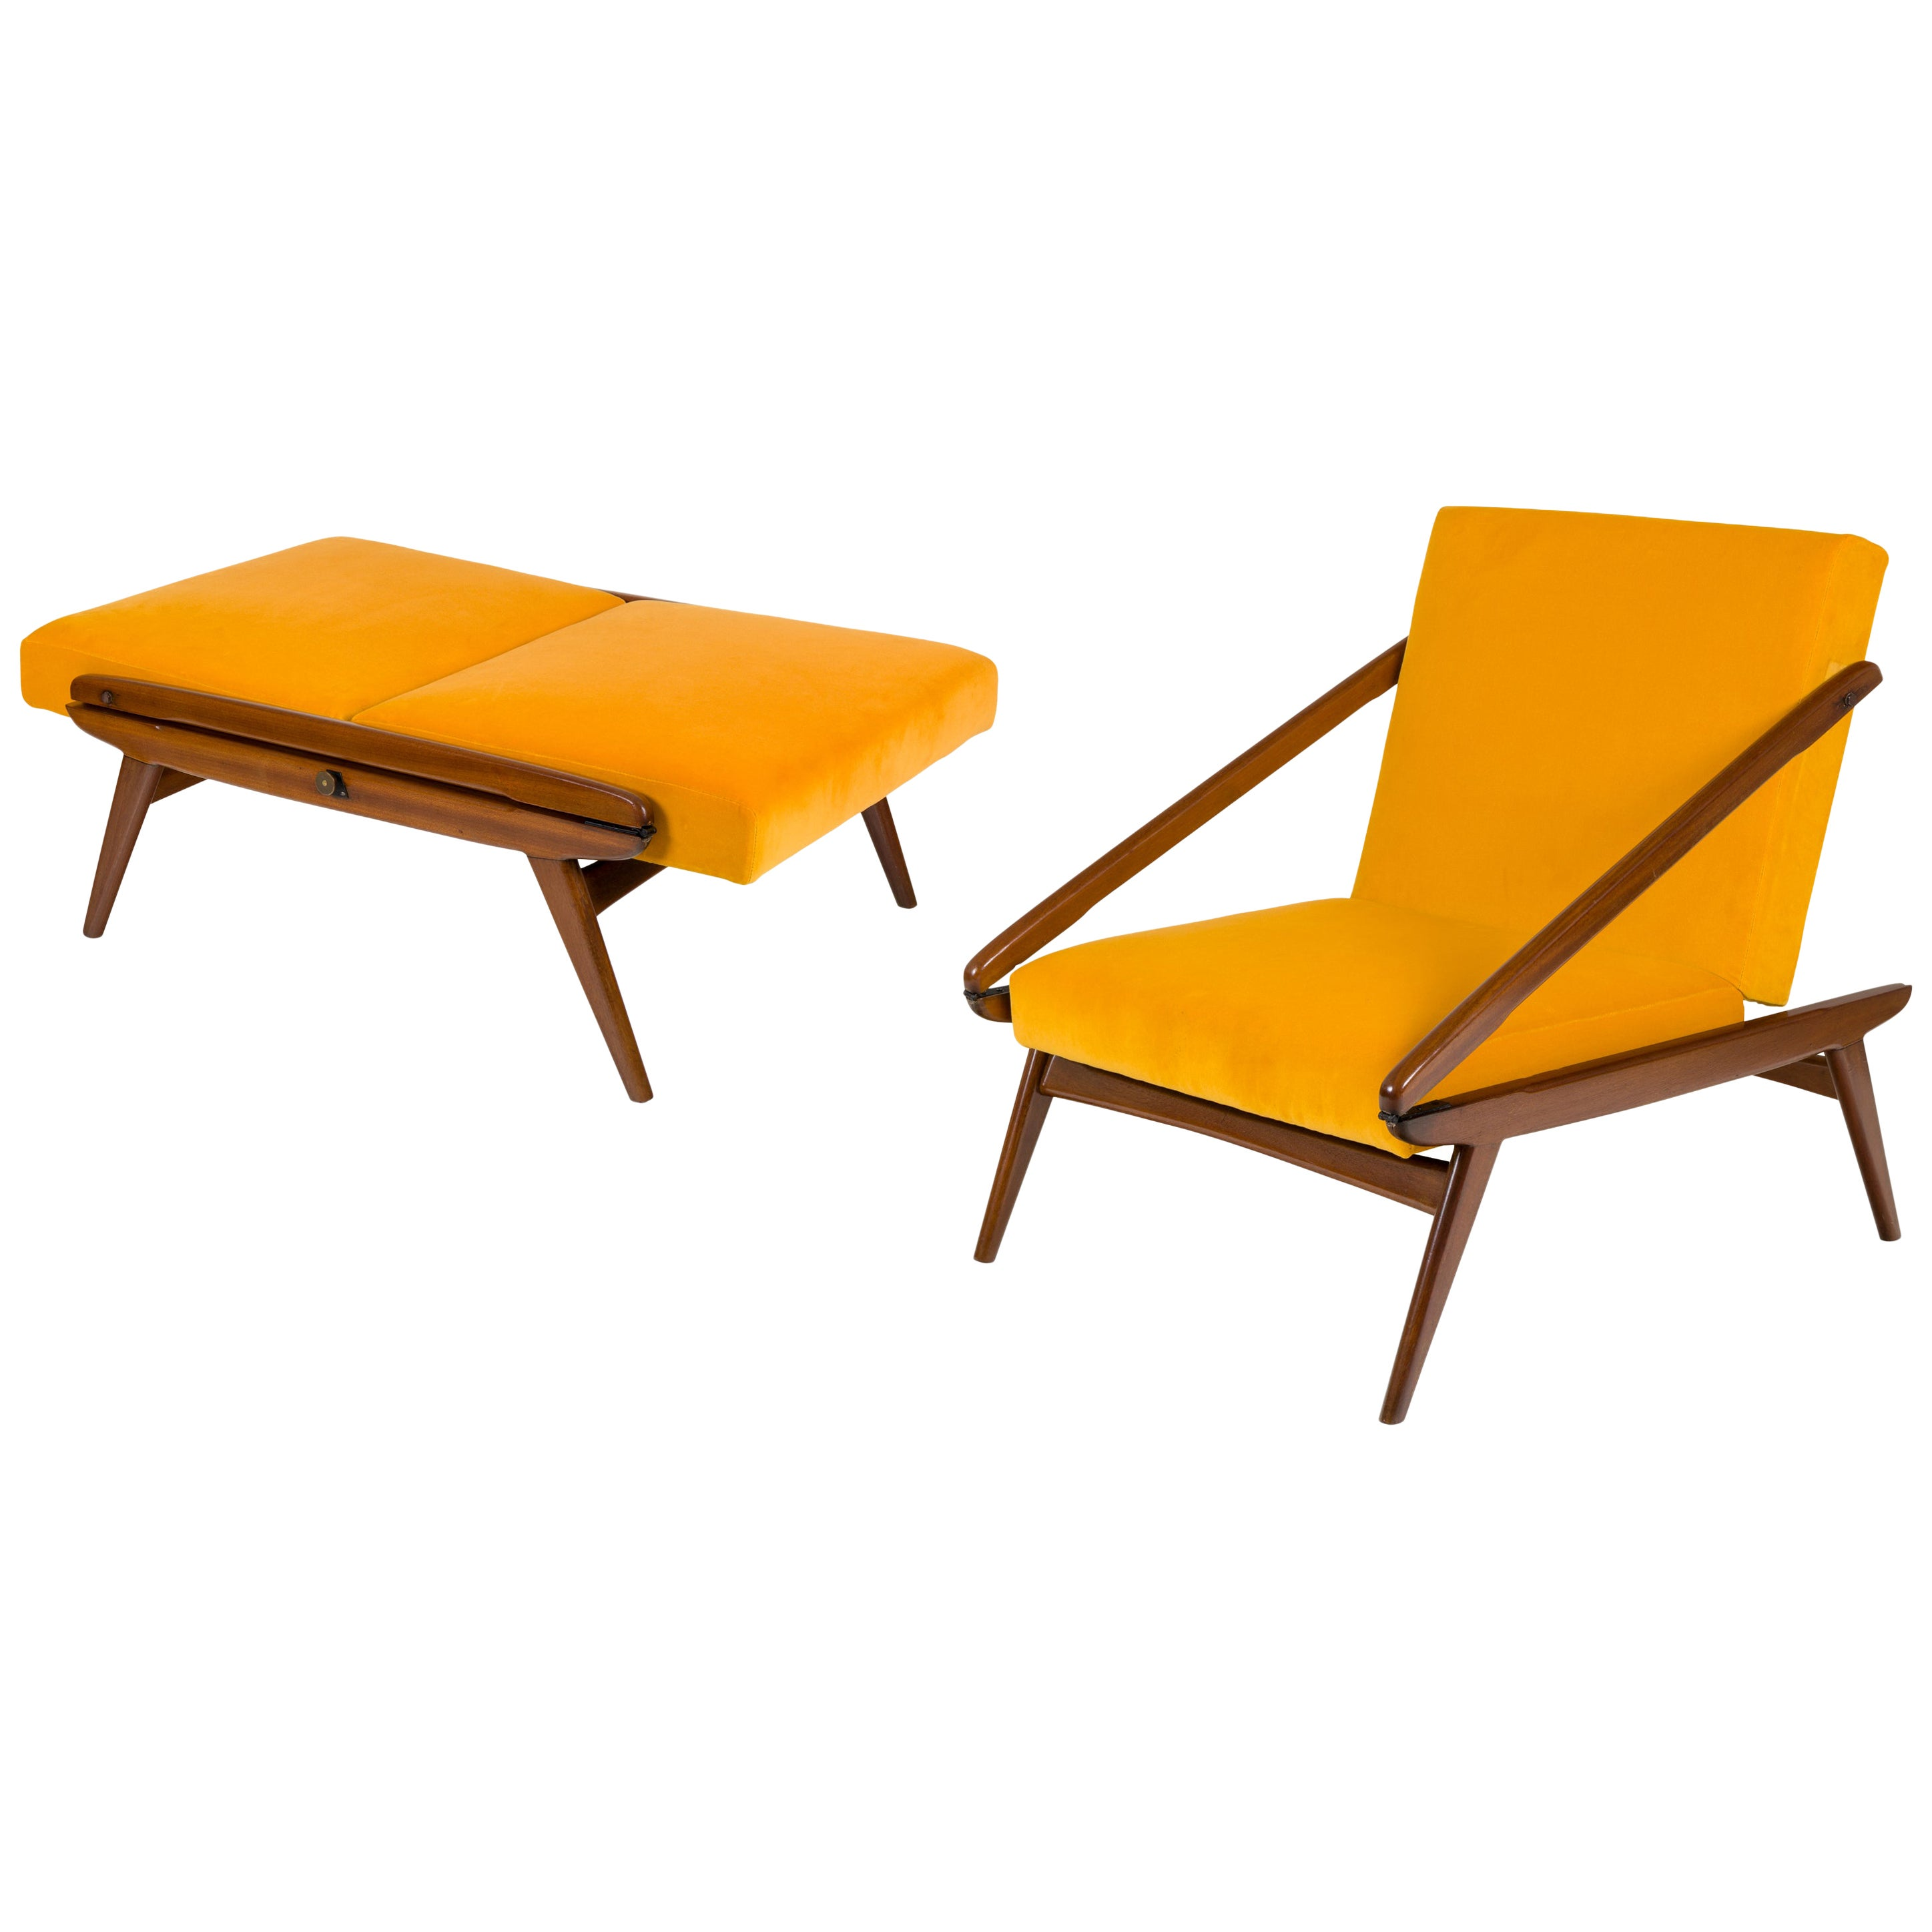 Gio Ponti Adjustable Armchairs/Ottomans, Italy 1955